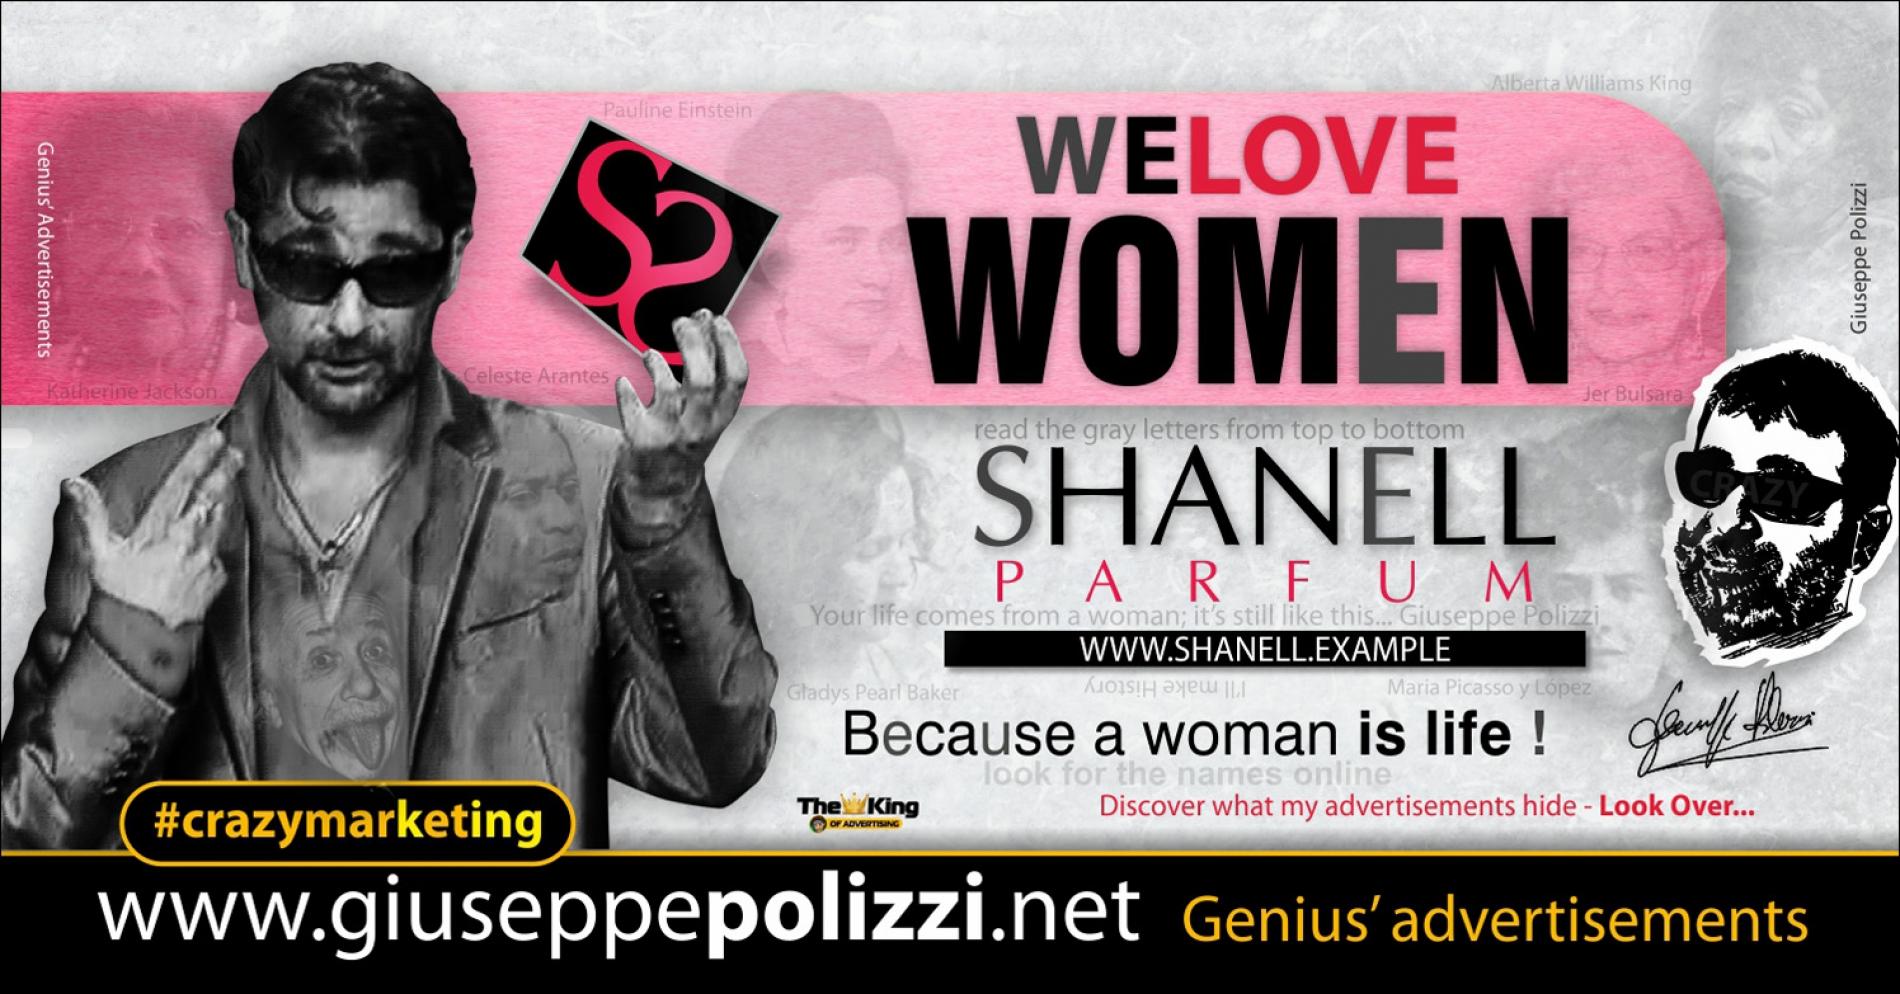 giuseppe Polizzi We LOVE women crazymarketing genius ing